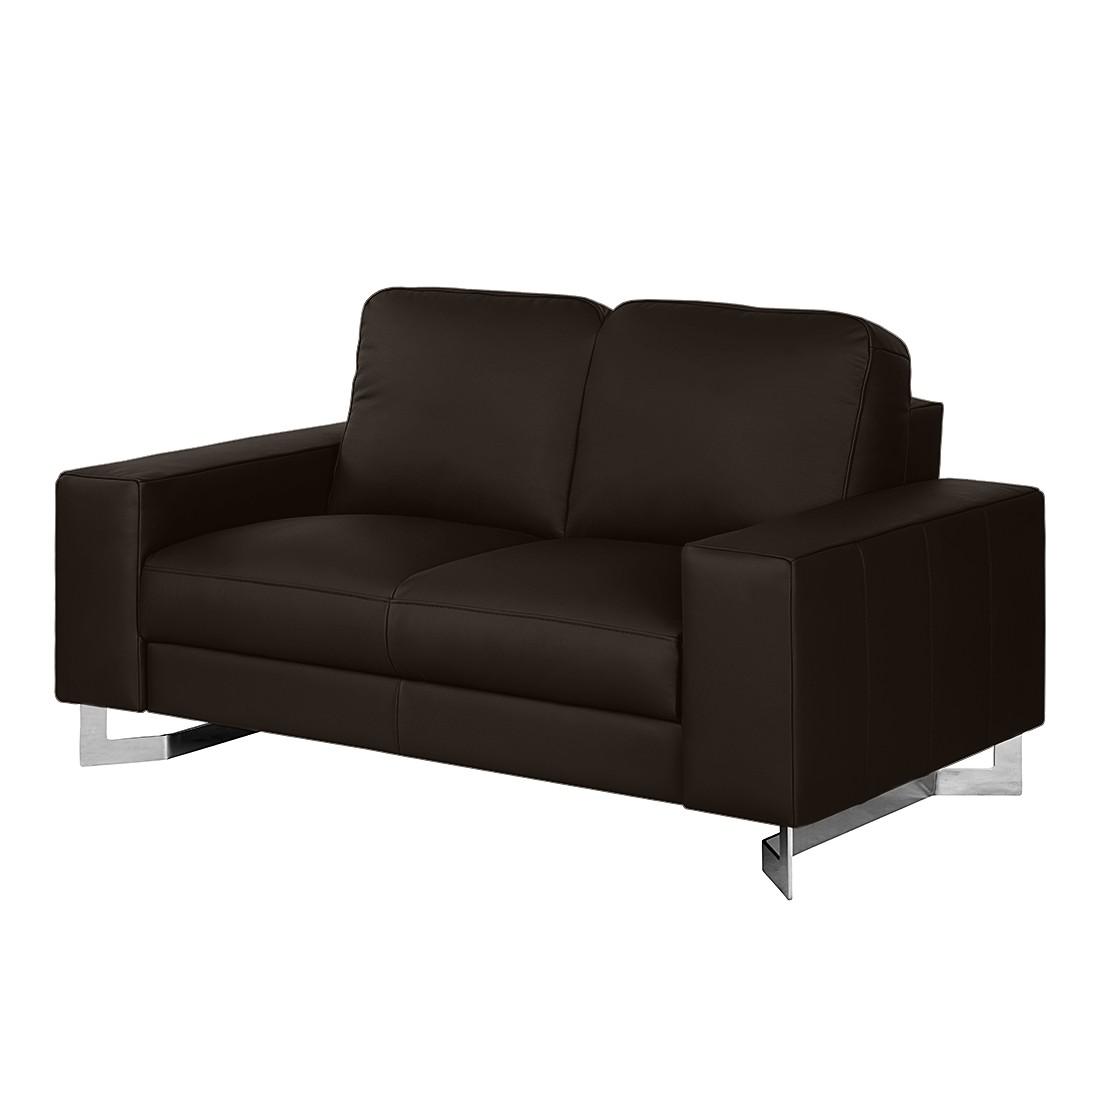 sofa licata 2 sitzer echtleder dunkelbraun nuovoform g nstig. Black Bedroom Furniture Sets. Home Design Ideas